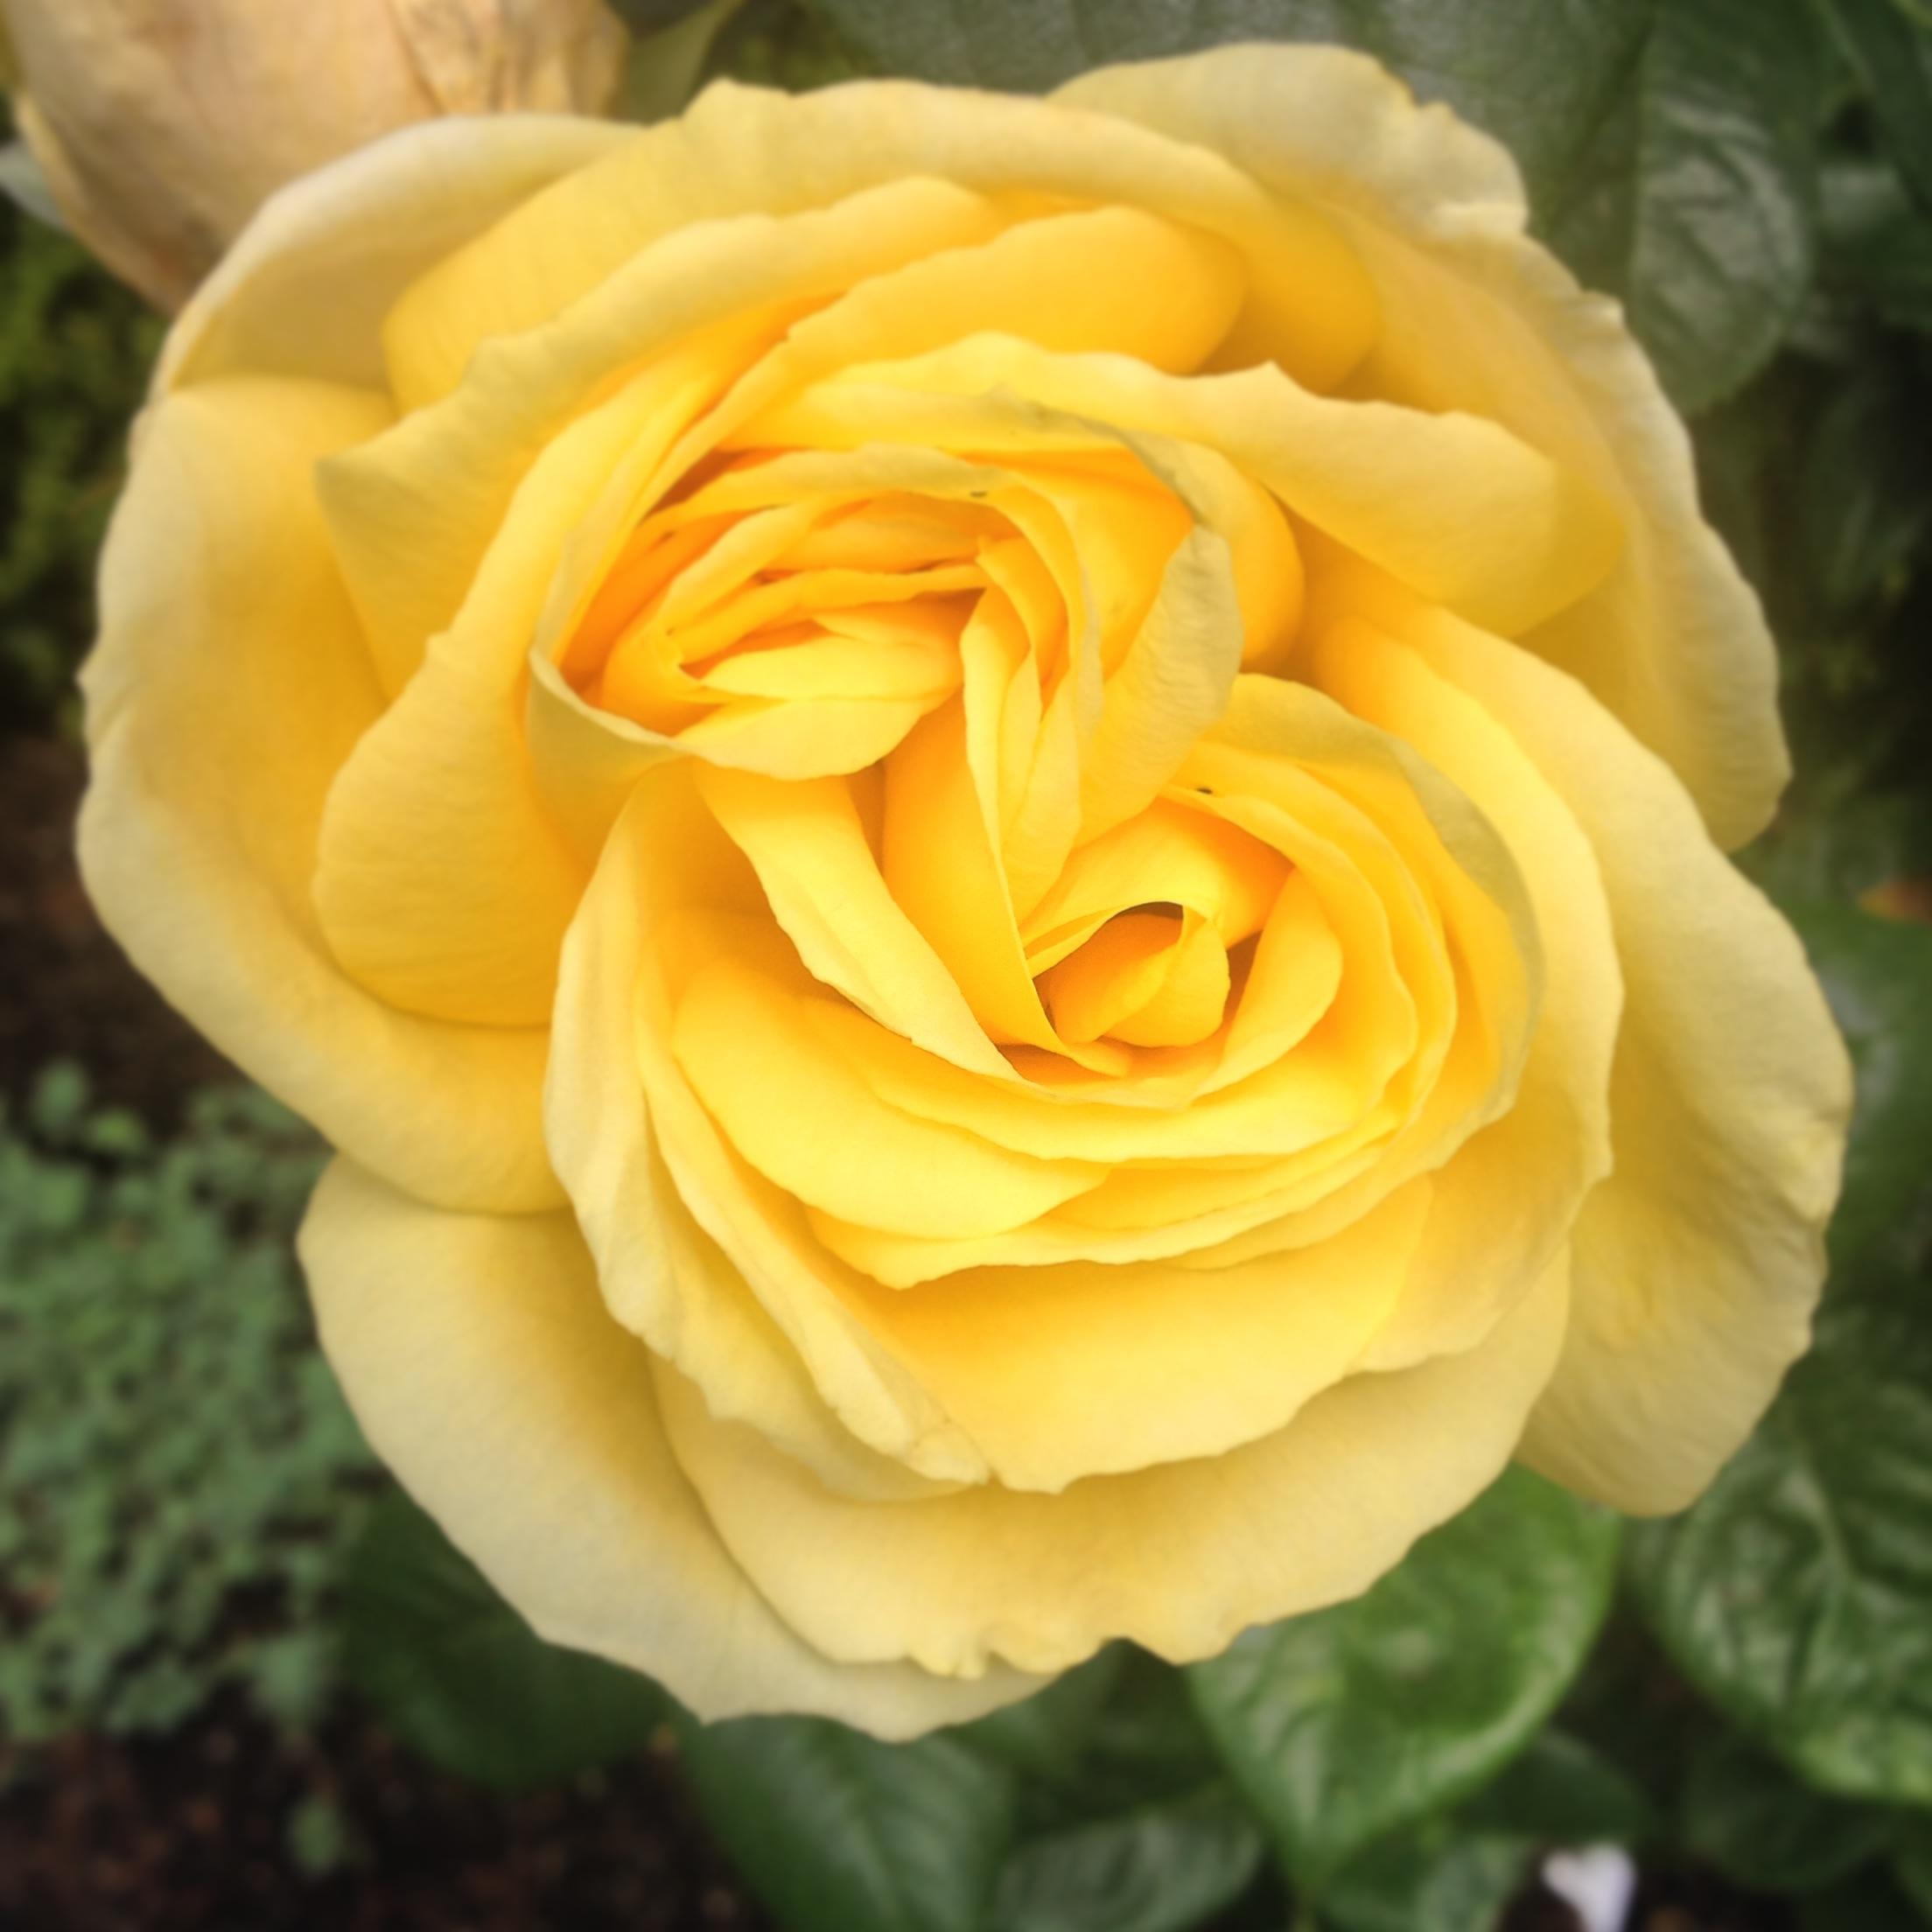 Pittock Mansion Rose 6/29/14